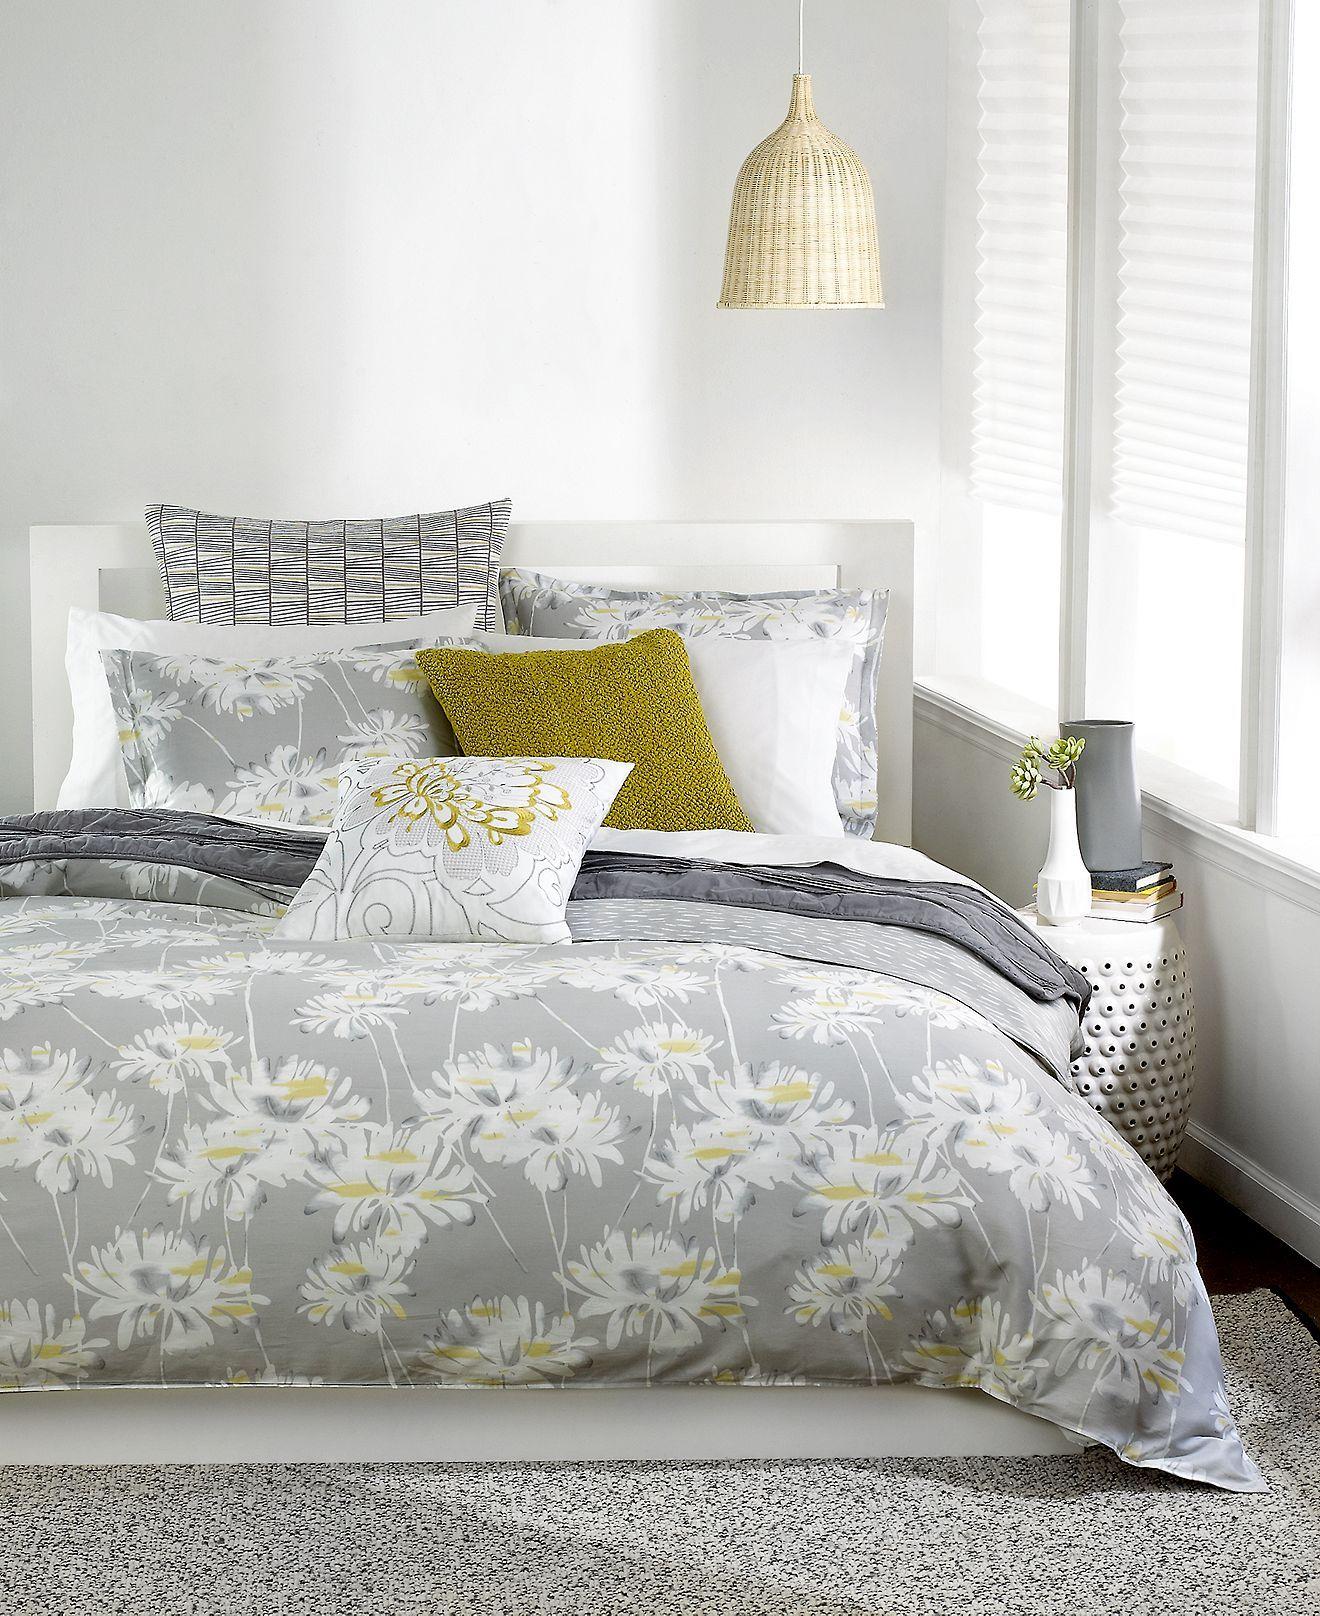 Bar Iii Grey Fl Bedding The Astrid Collection Bariii Comforter